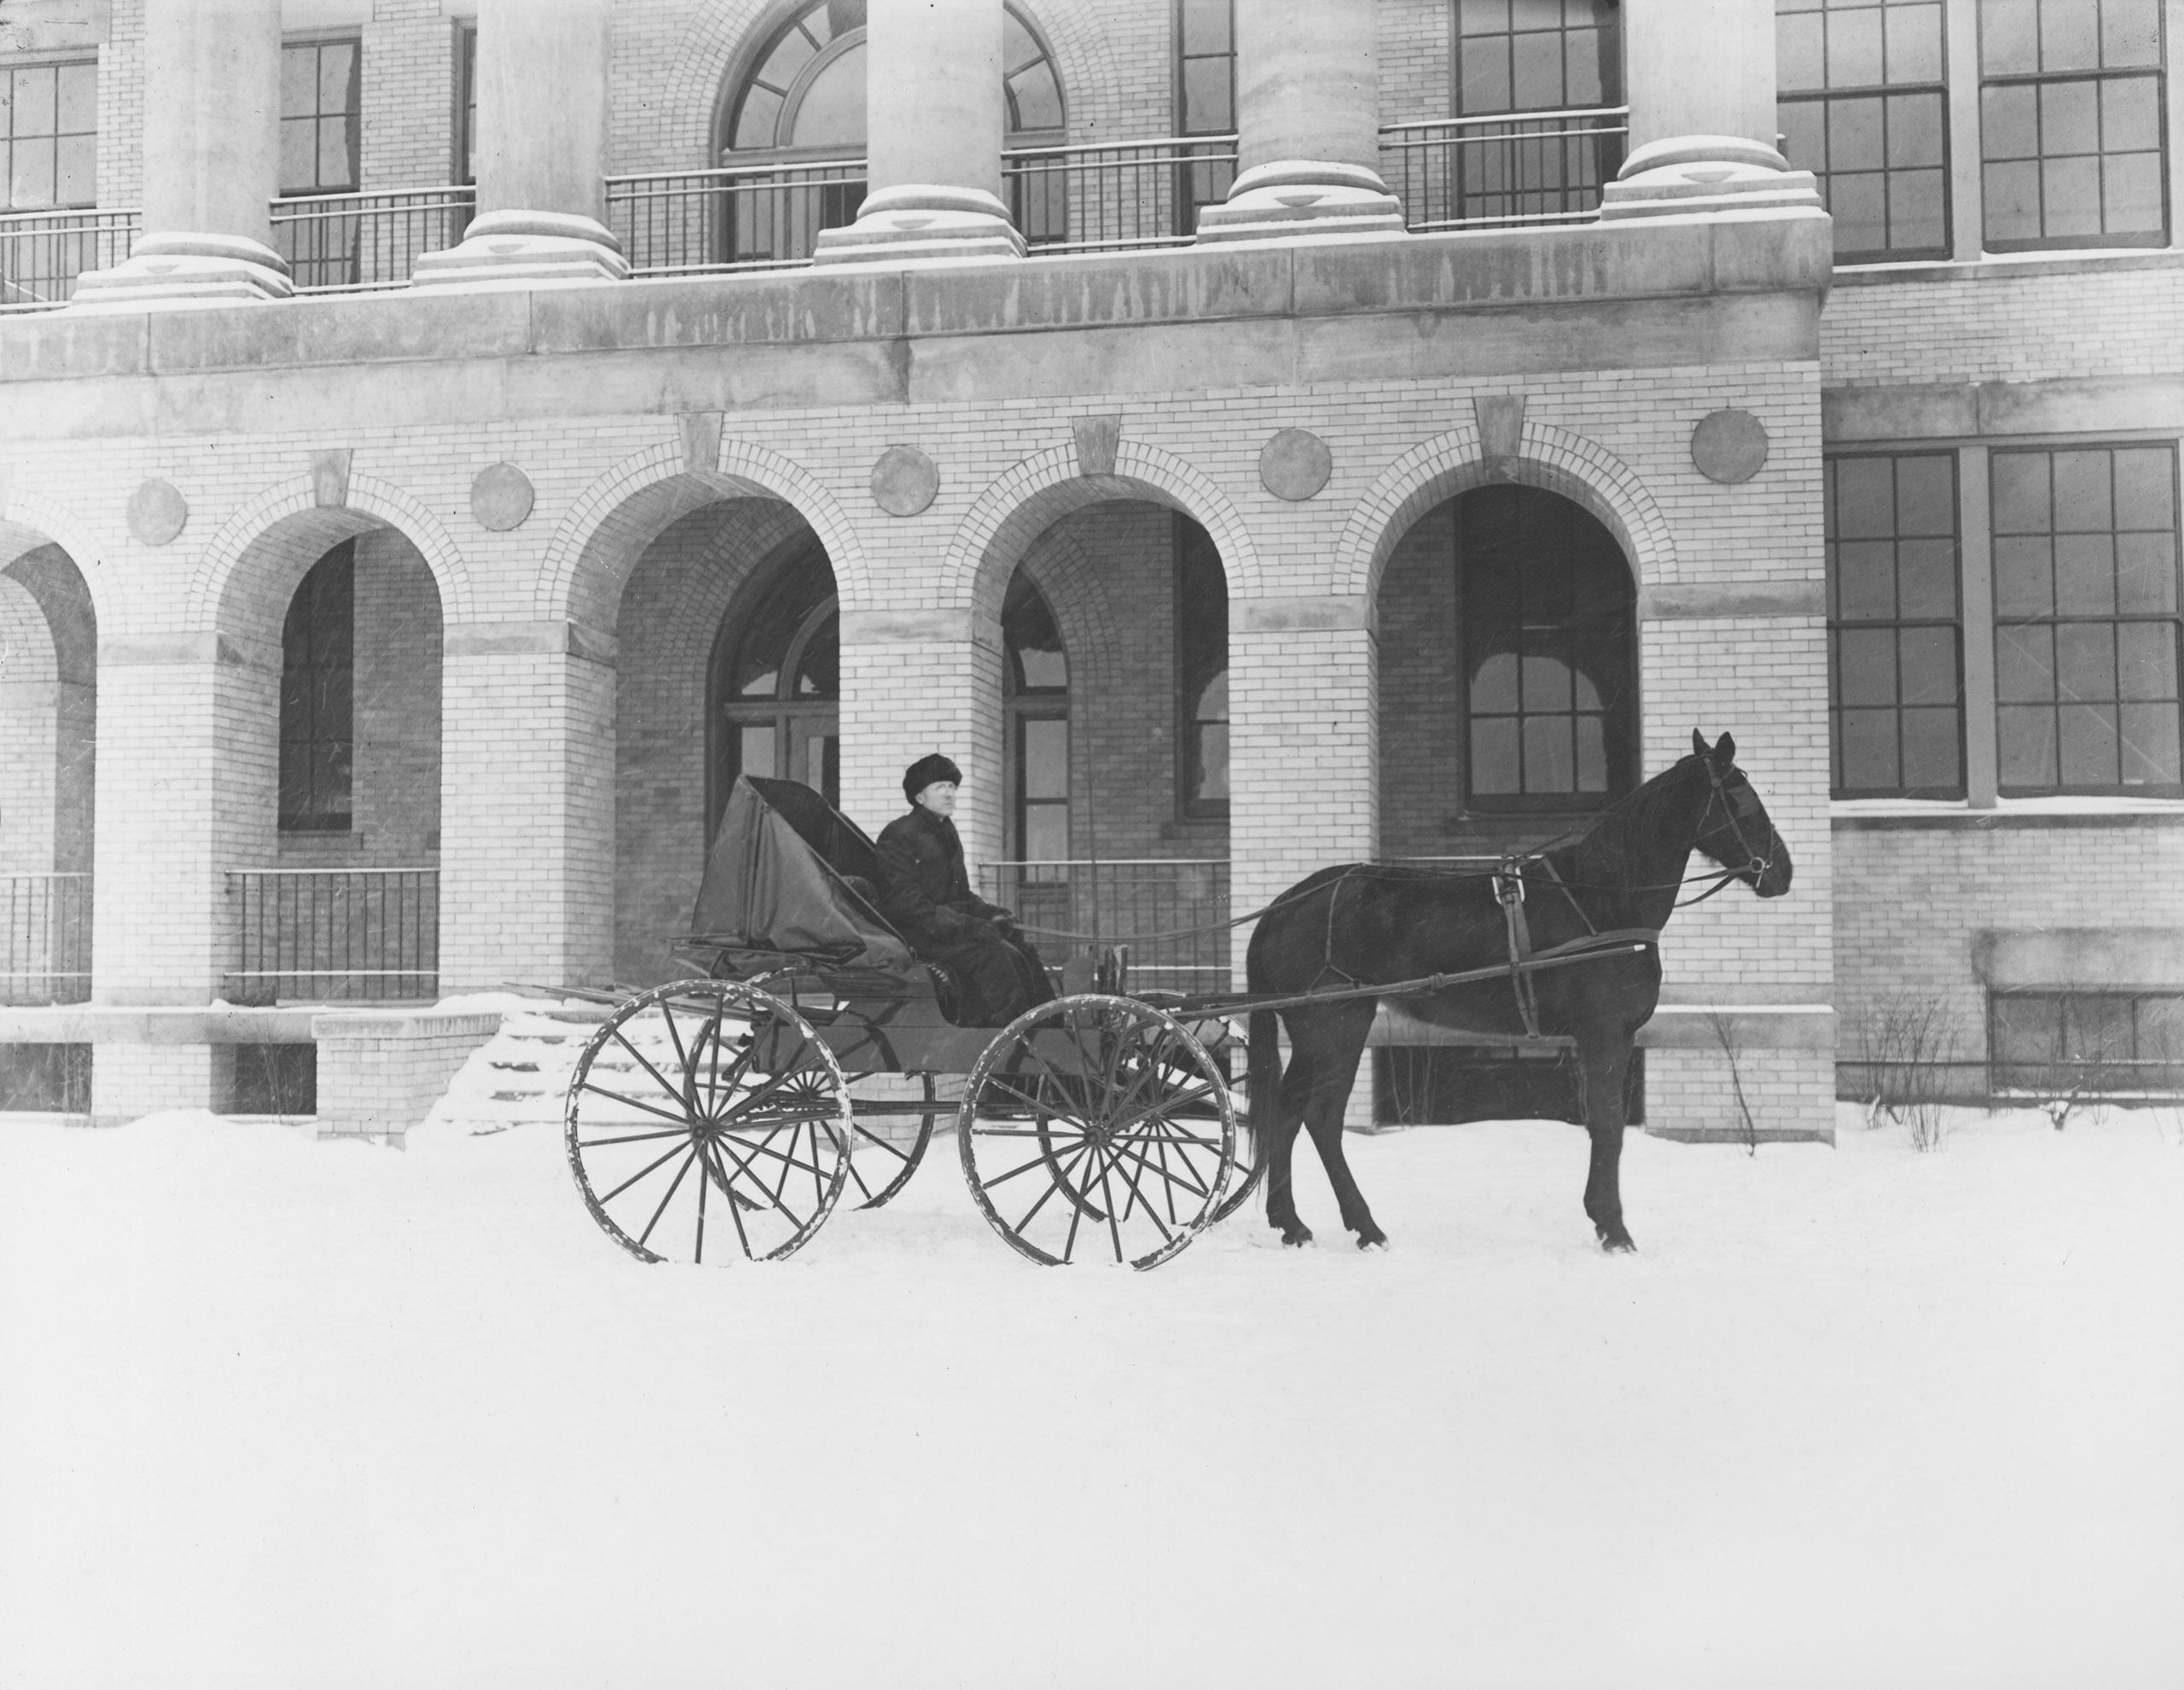 Winter, 1916